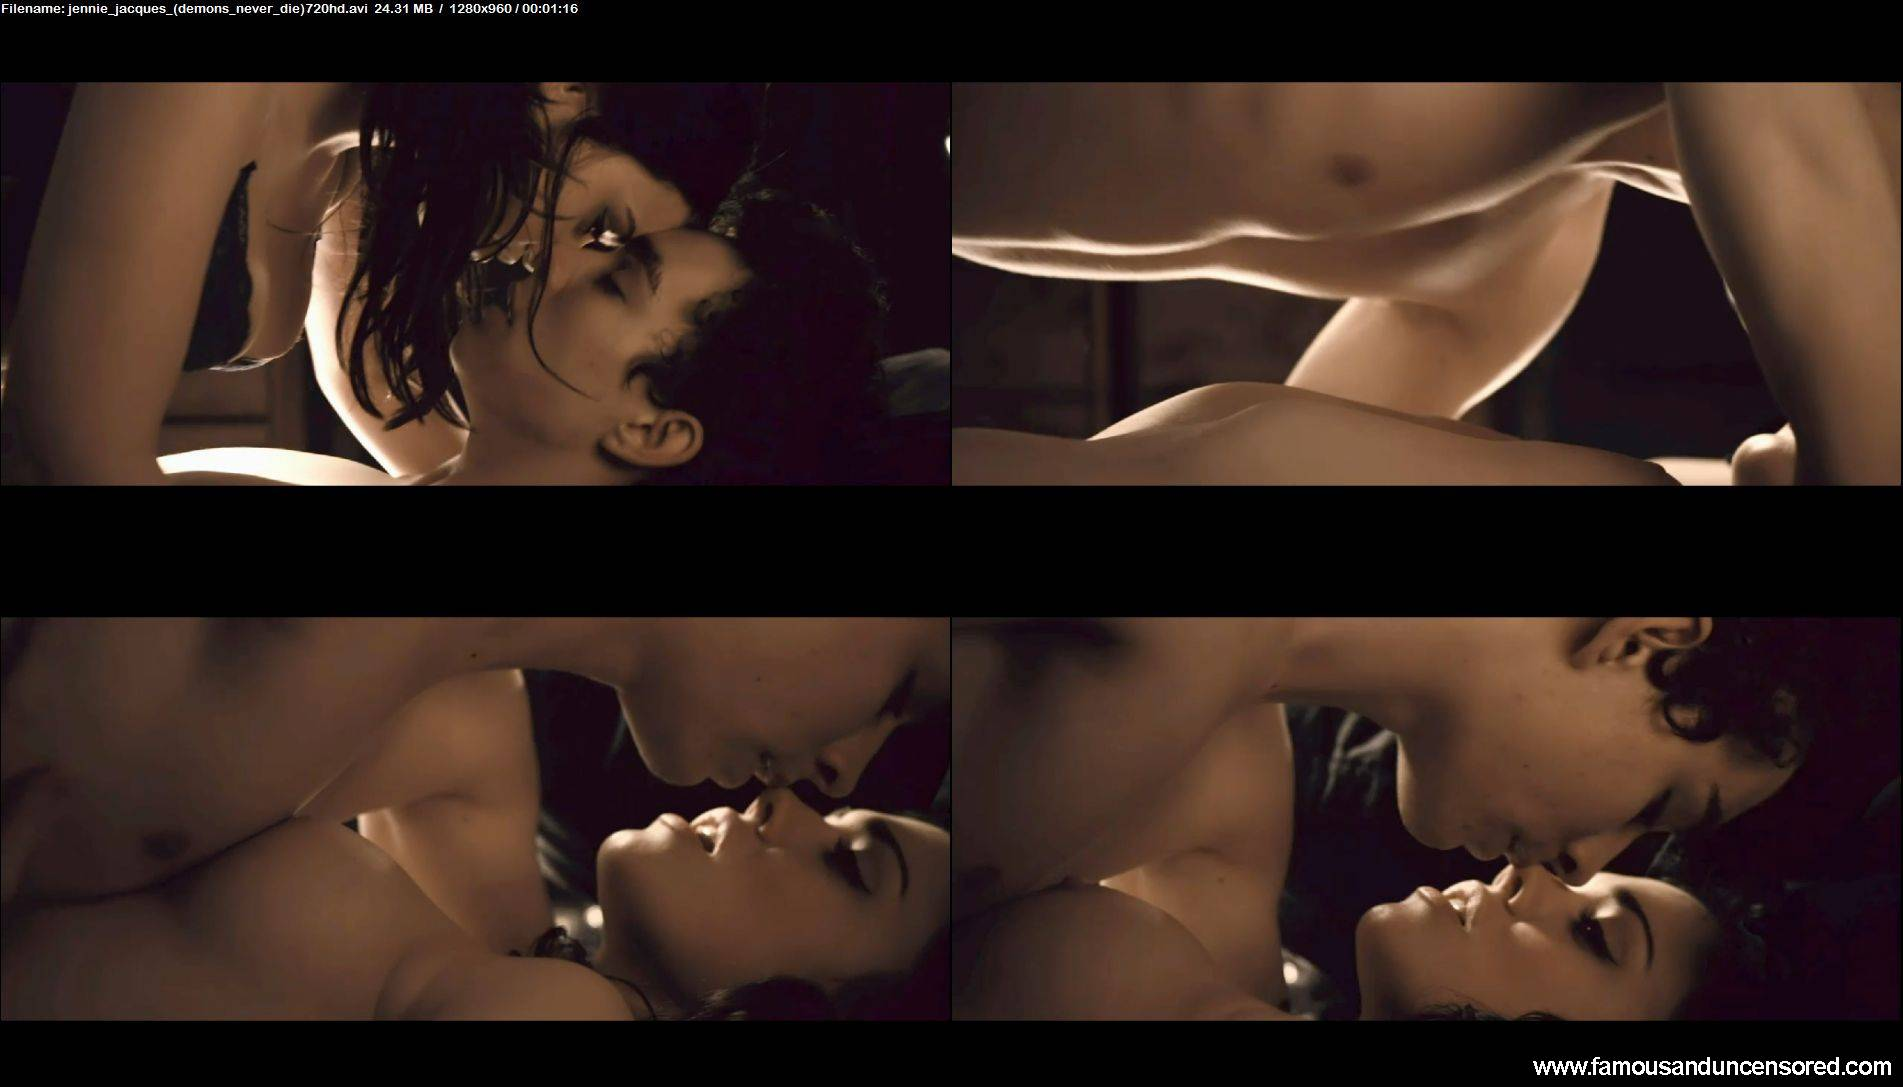 Jennie jacques hard sex scene in desperate romantics series 3